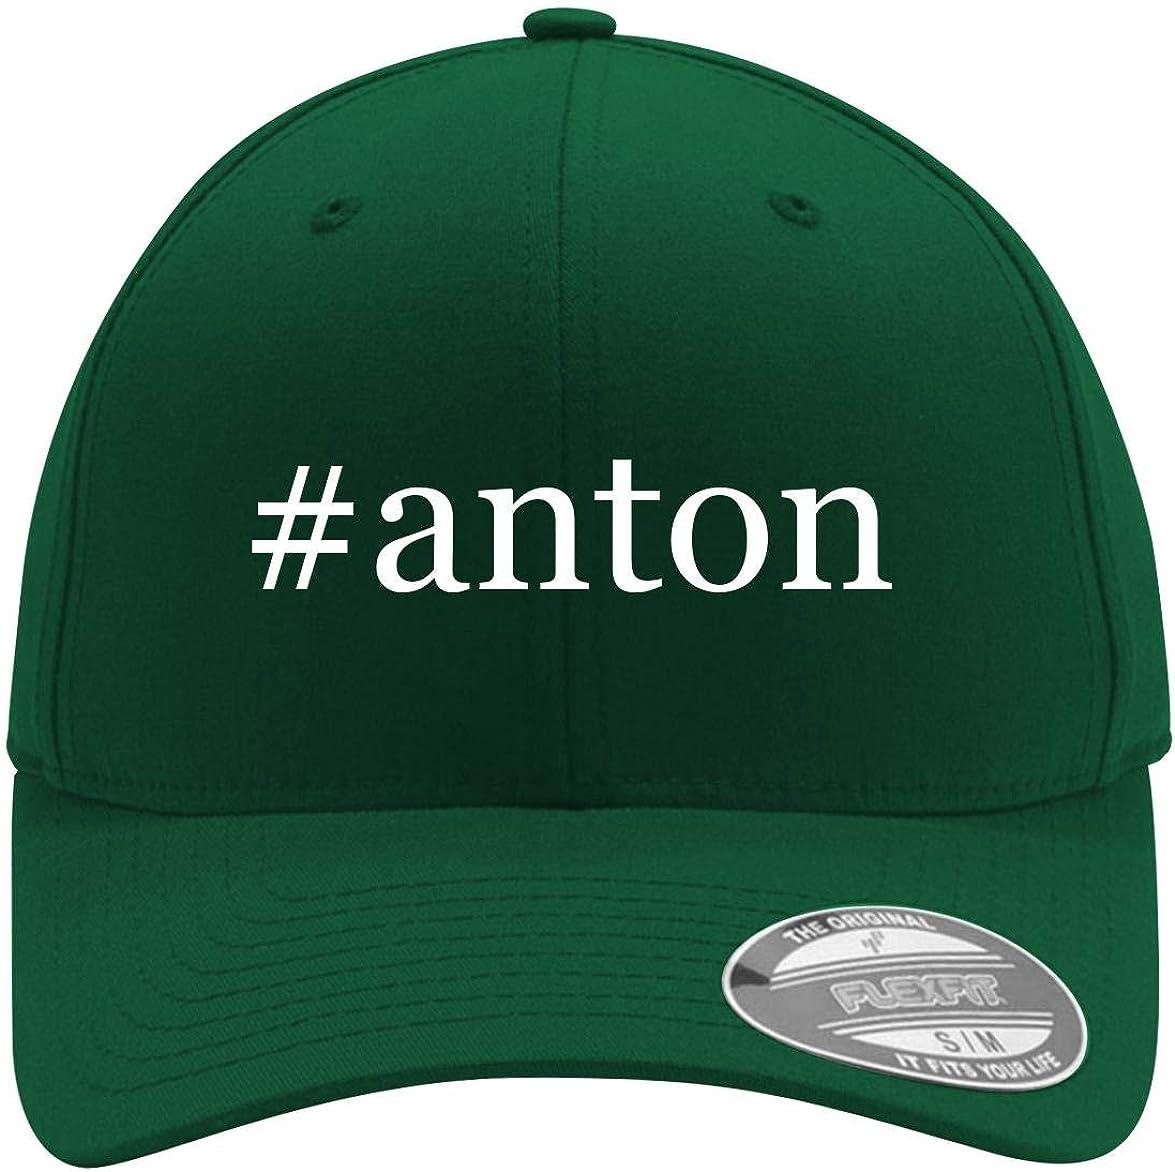 #anton - Adult Men's Hashtag Flexfit Baseball Hat Cap